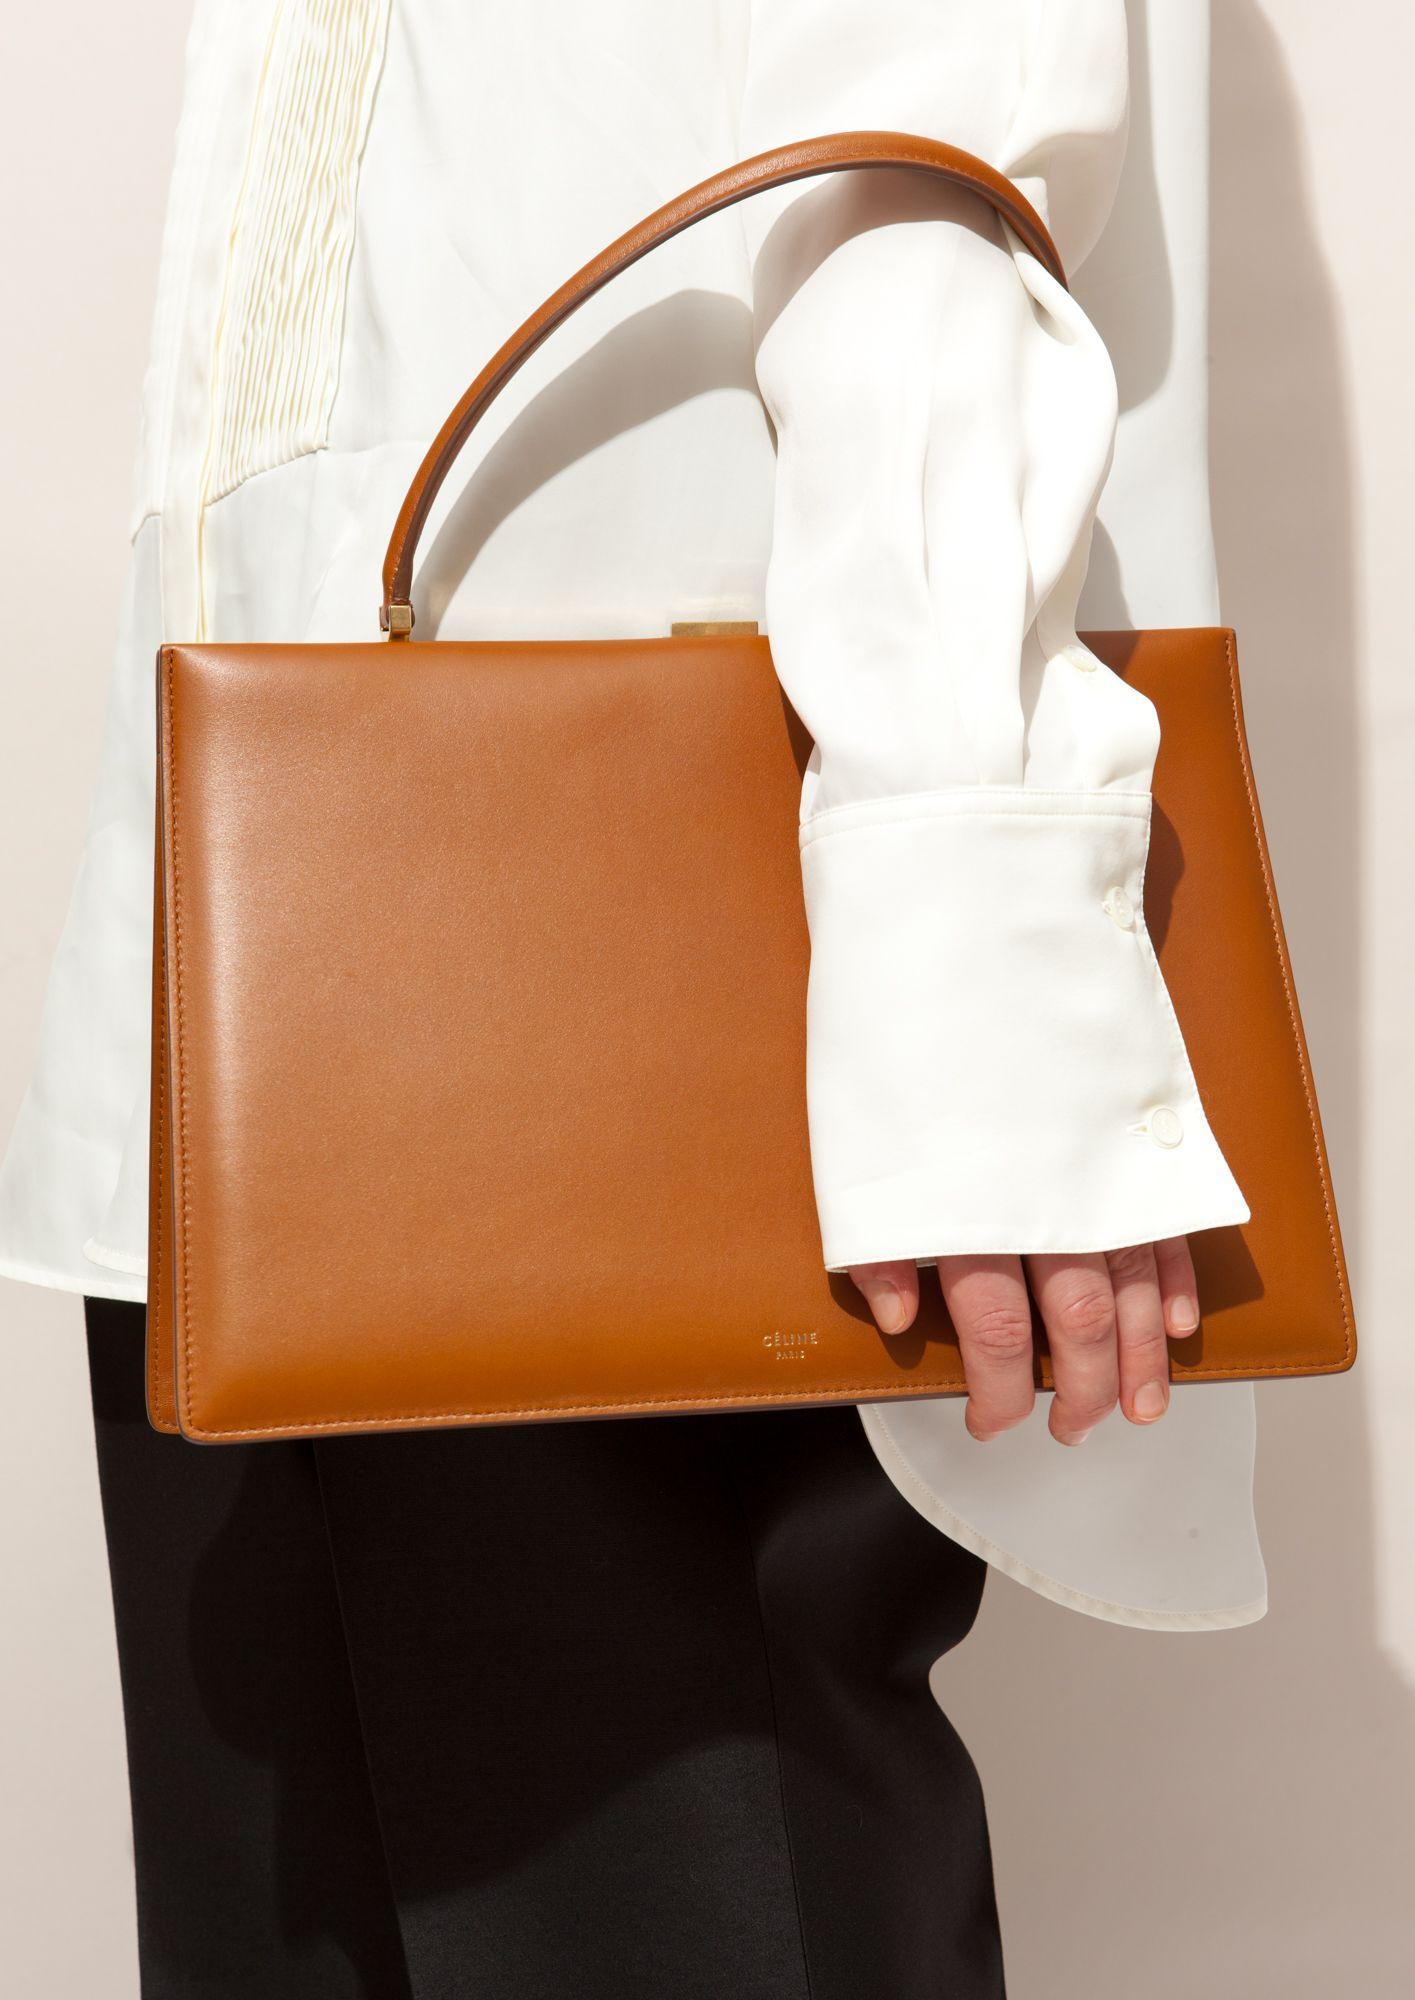 2a99bf60d2 Céline tan medium clasp bag